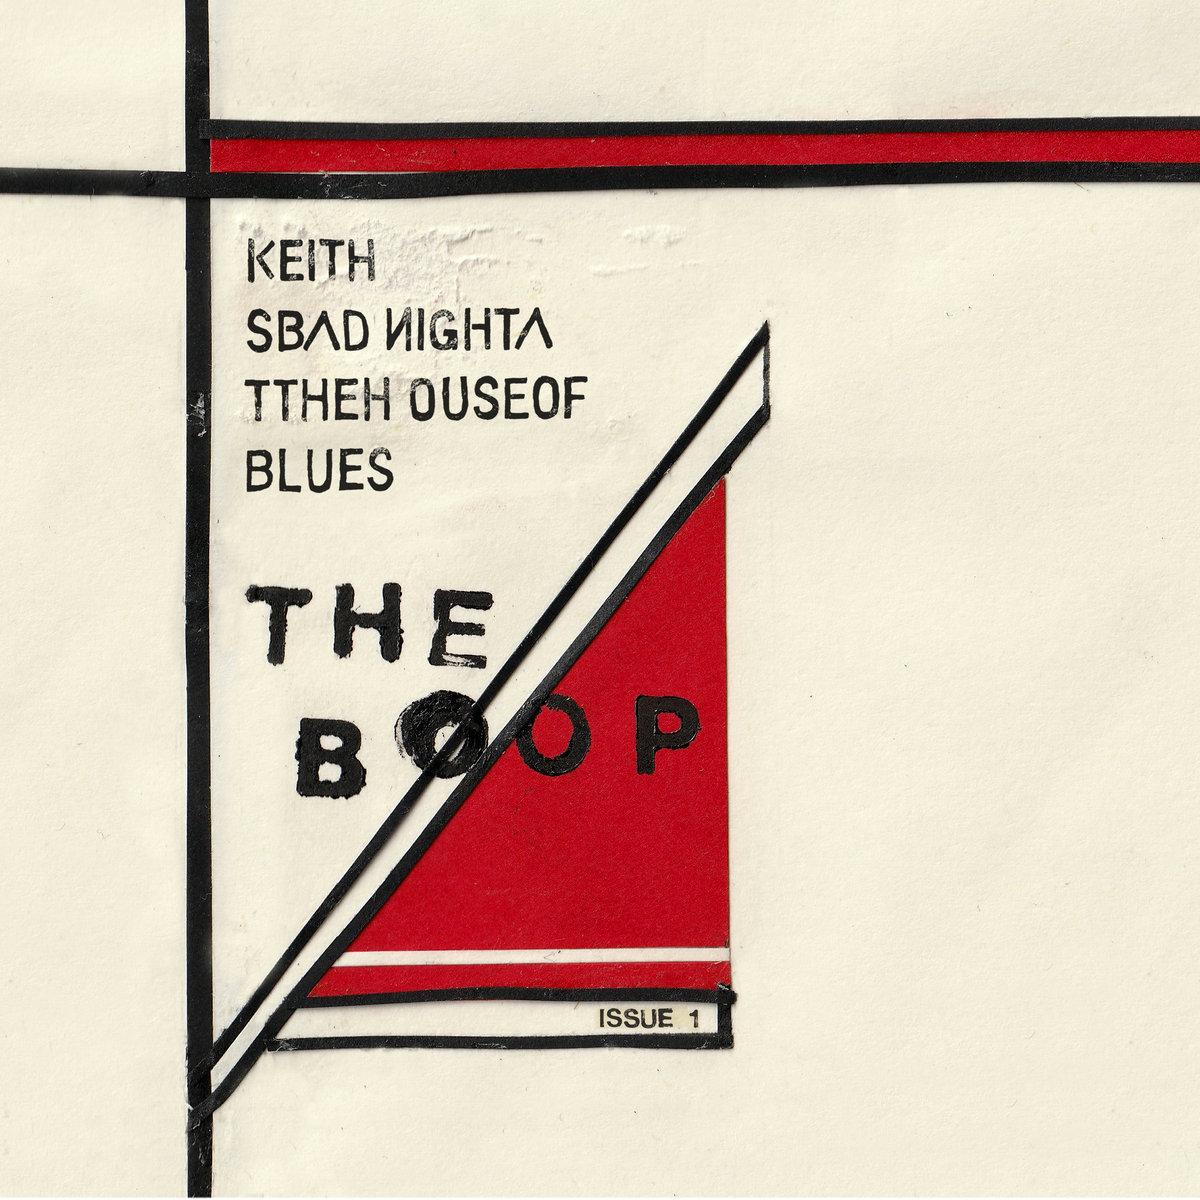 Keith Sbad Nighta Ttheh Ouseof Blues